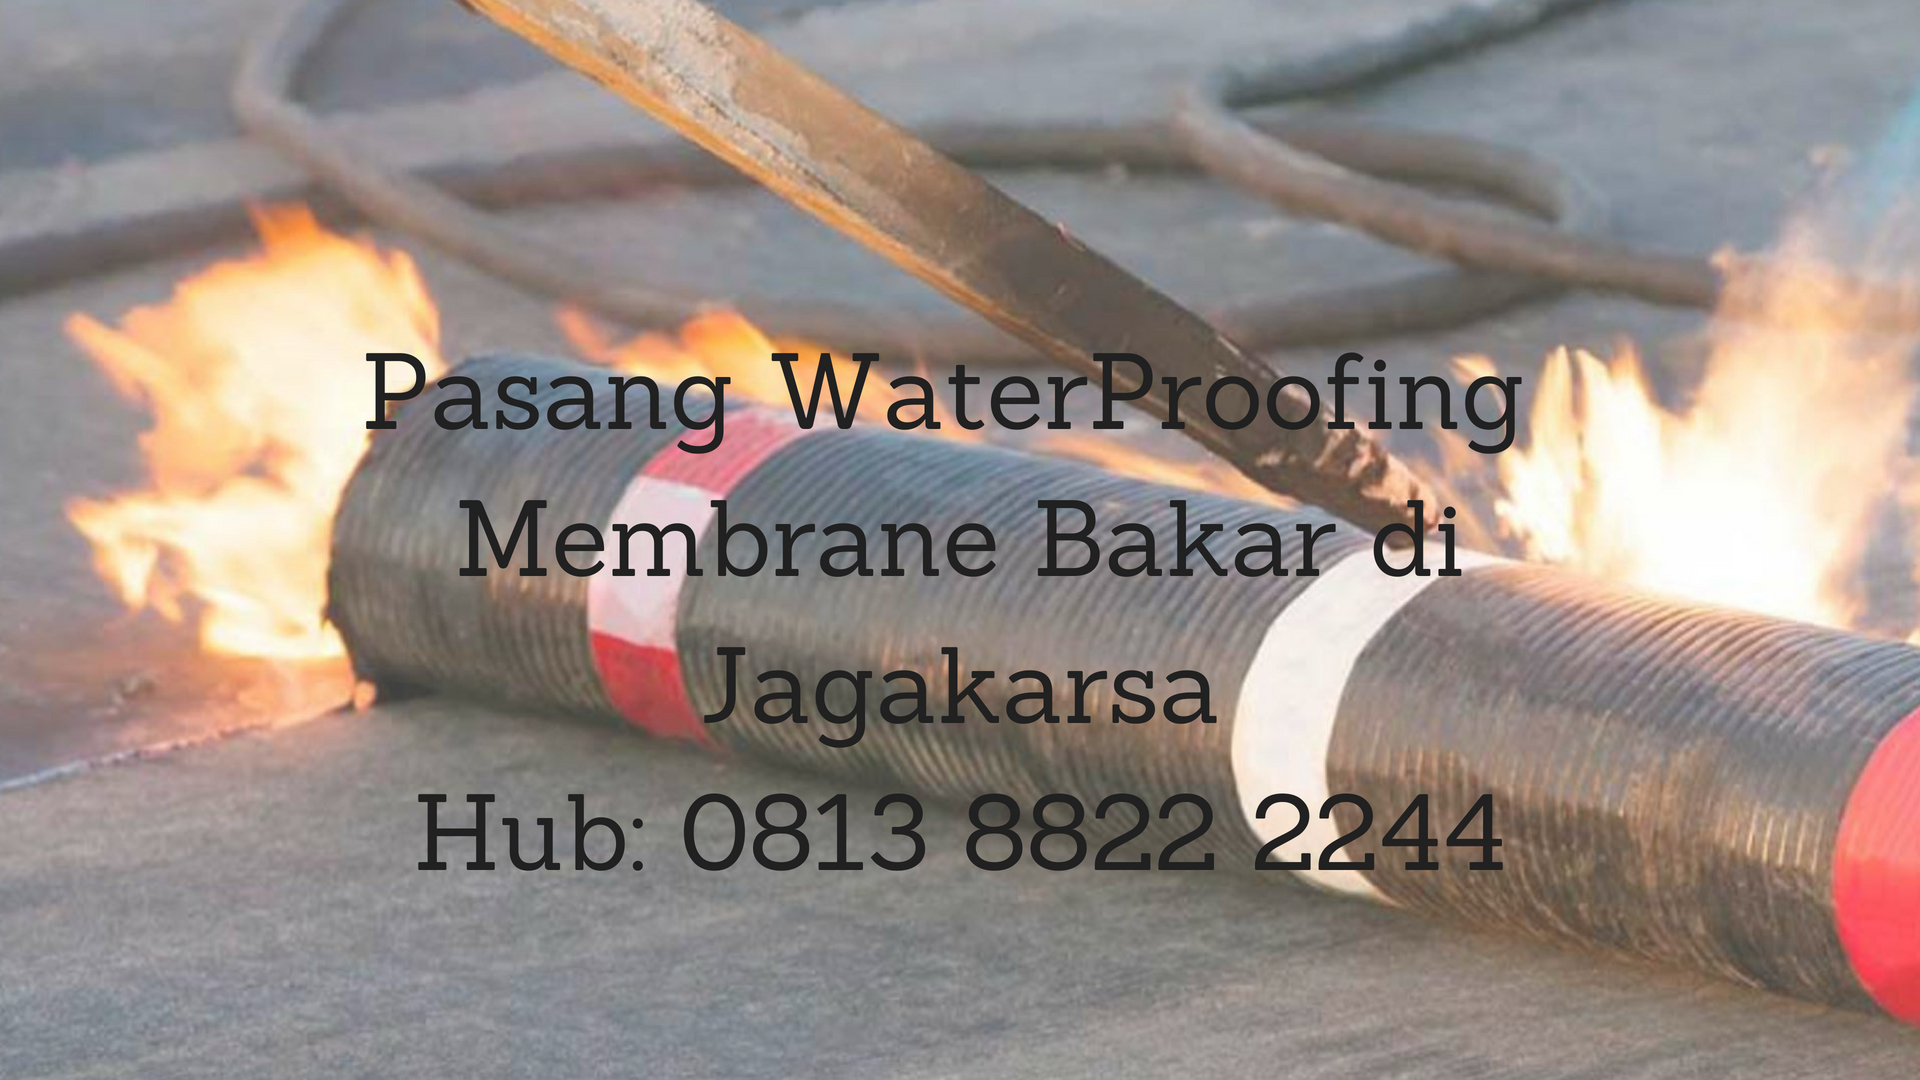 JASA PASANG WATERPROFING MEMBRANE BAKAR DI JAGAKARSA. HUB: 0813 8822 2244